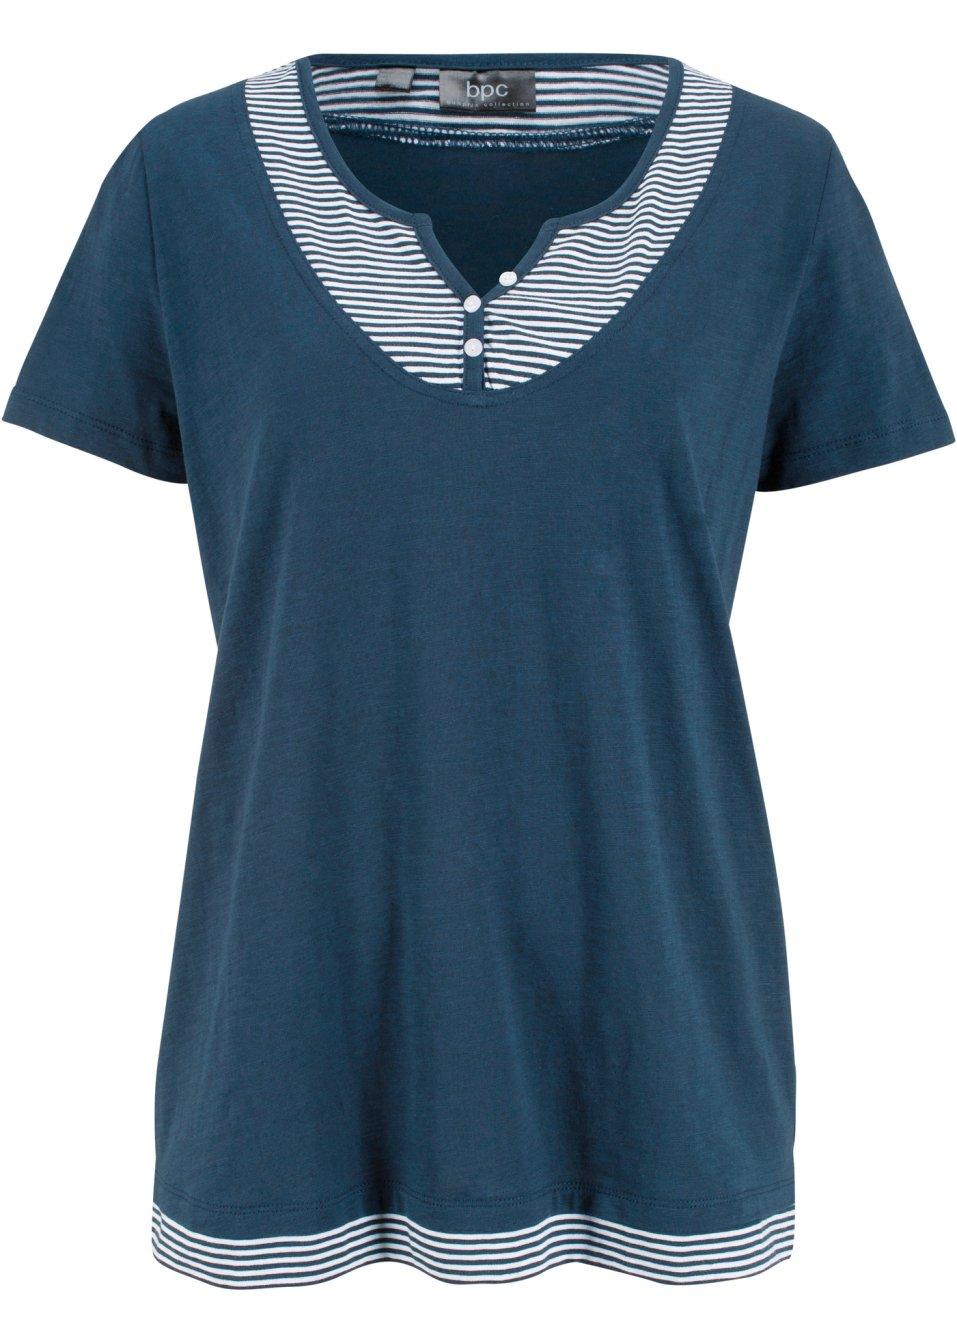 Figurumspielendes Kurzarm-Shirt in 2in1 Optik - dunkelblau kUy2W QsS2Z